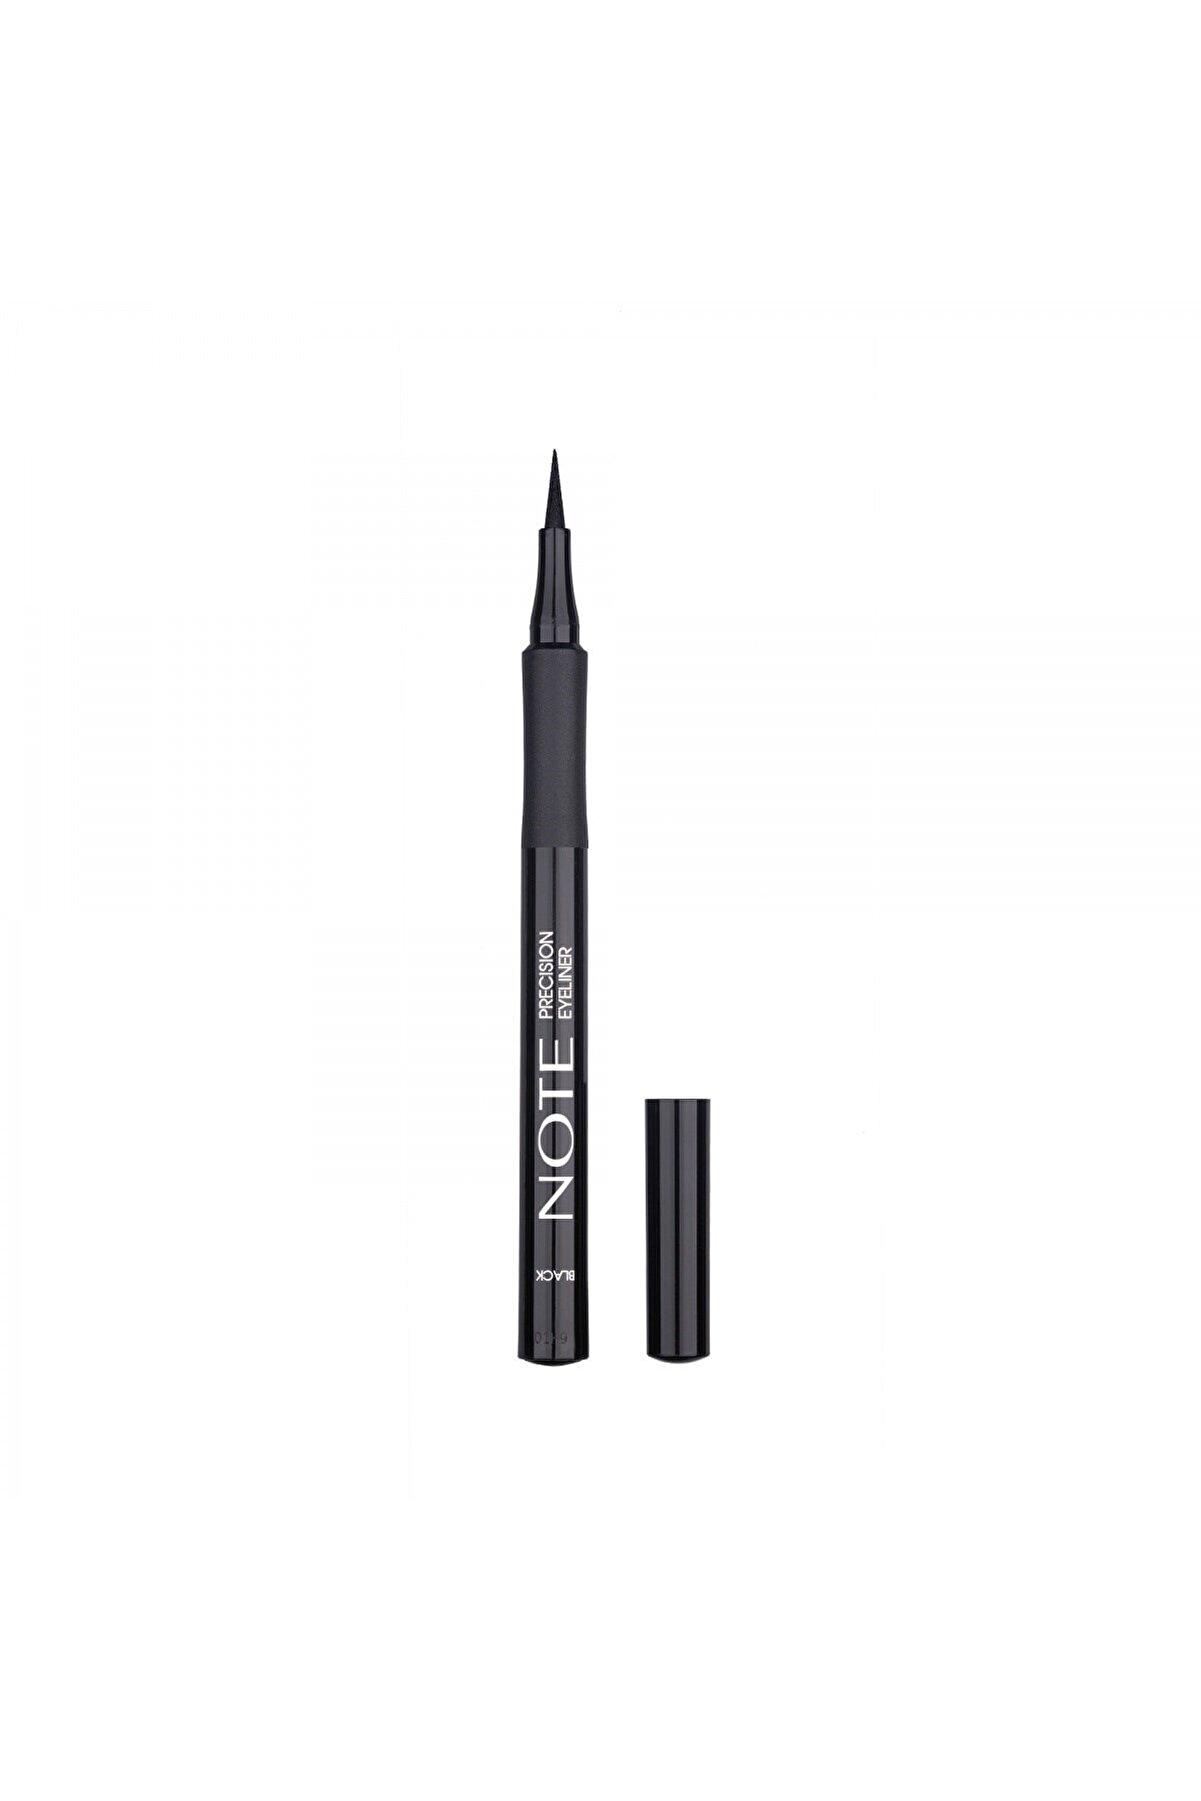 Note Cosmetics Siyah Eyeliner - Precision Eyeliner Black 8680705332013